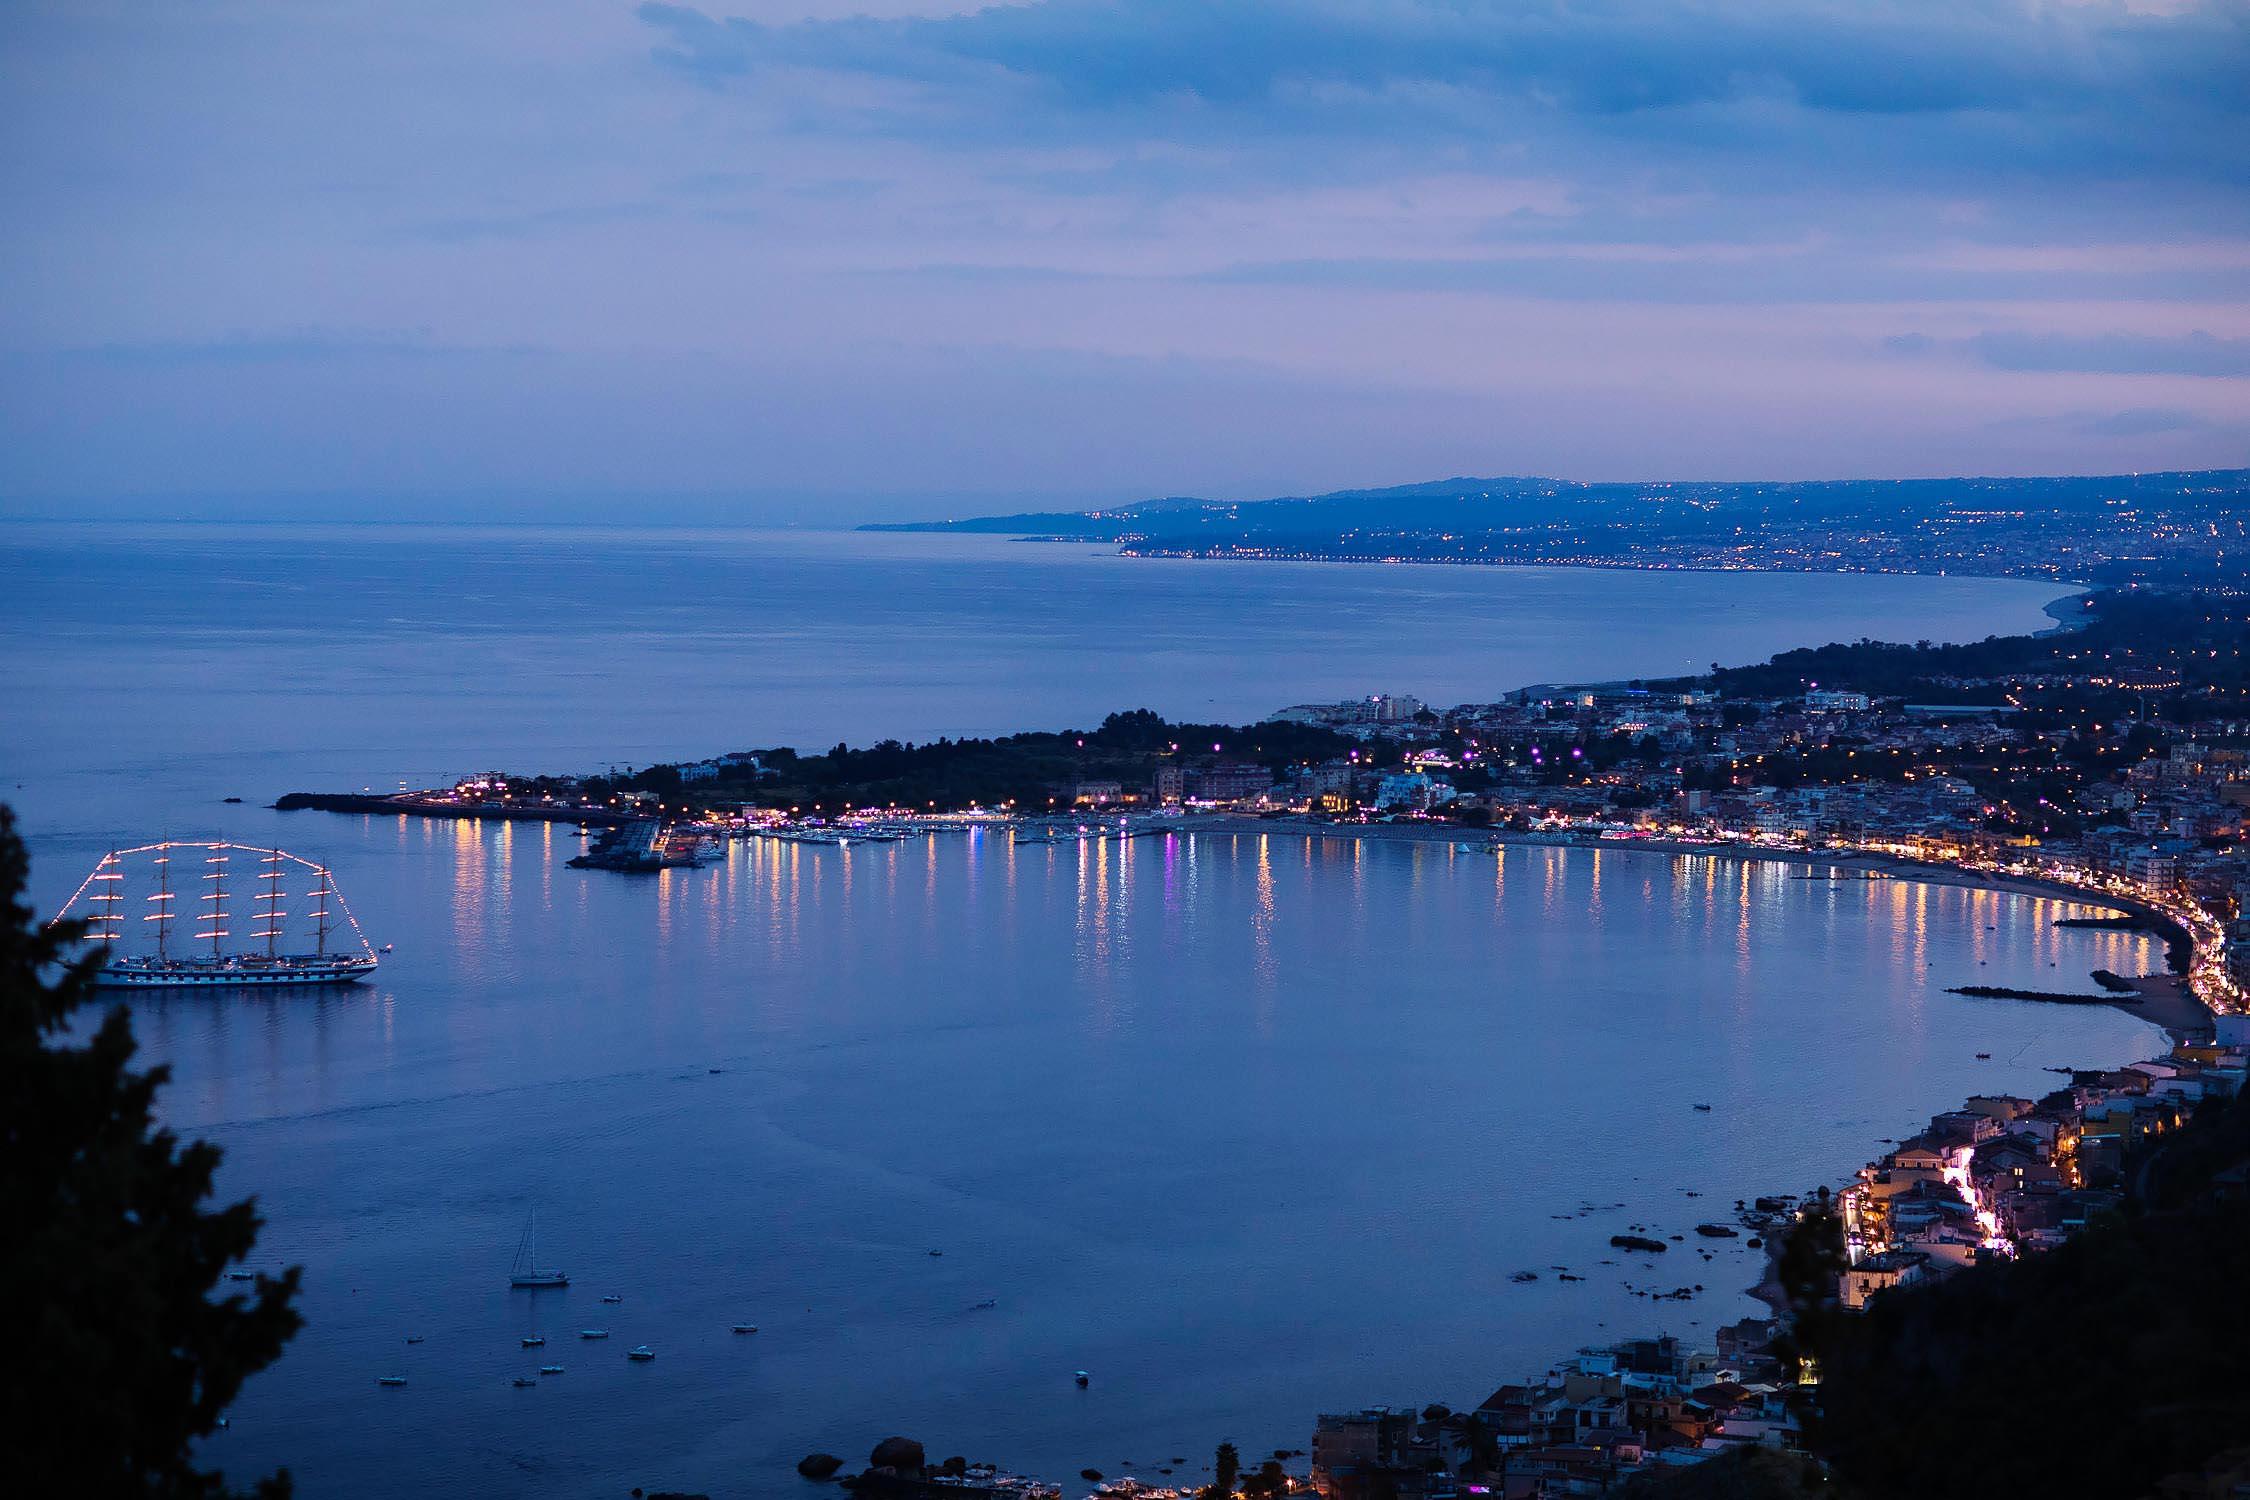 The Gulf of Taormina seen from the San Domenico Palace, wedding photo by Nino Lombardo